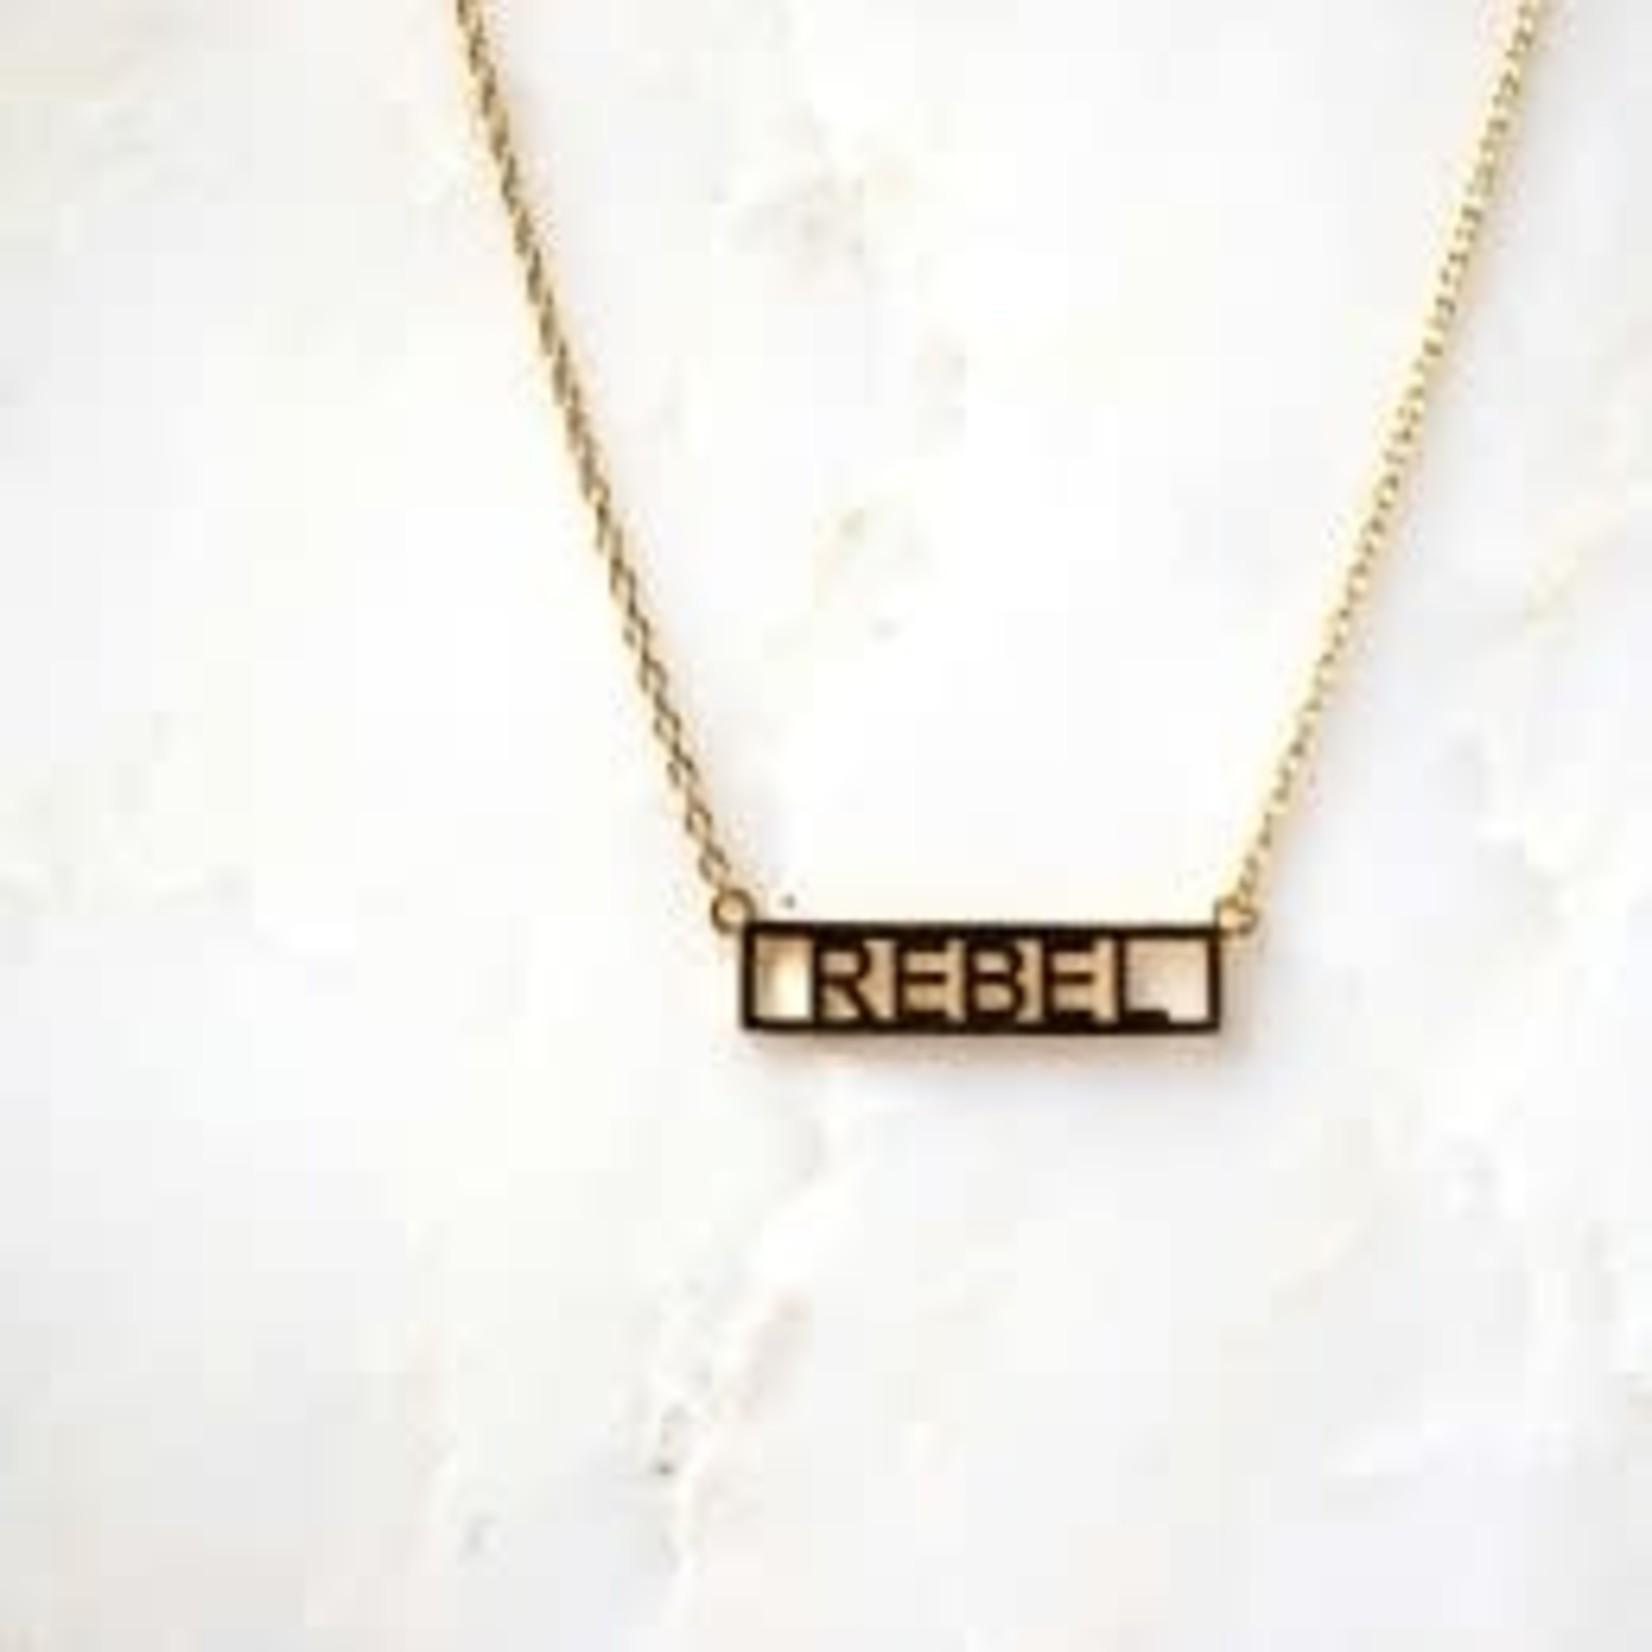 "He Said She Said He Said She Said Necklace 16""-18"" Rebel"